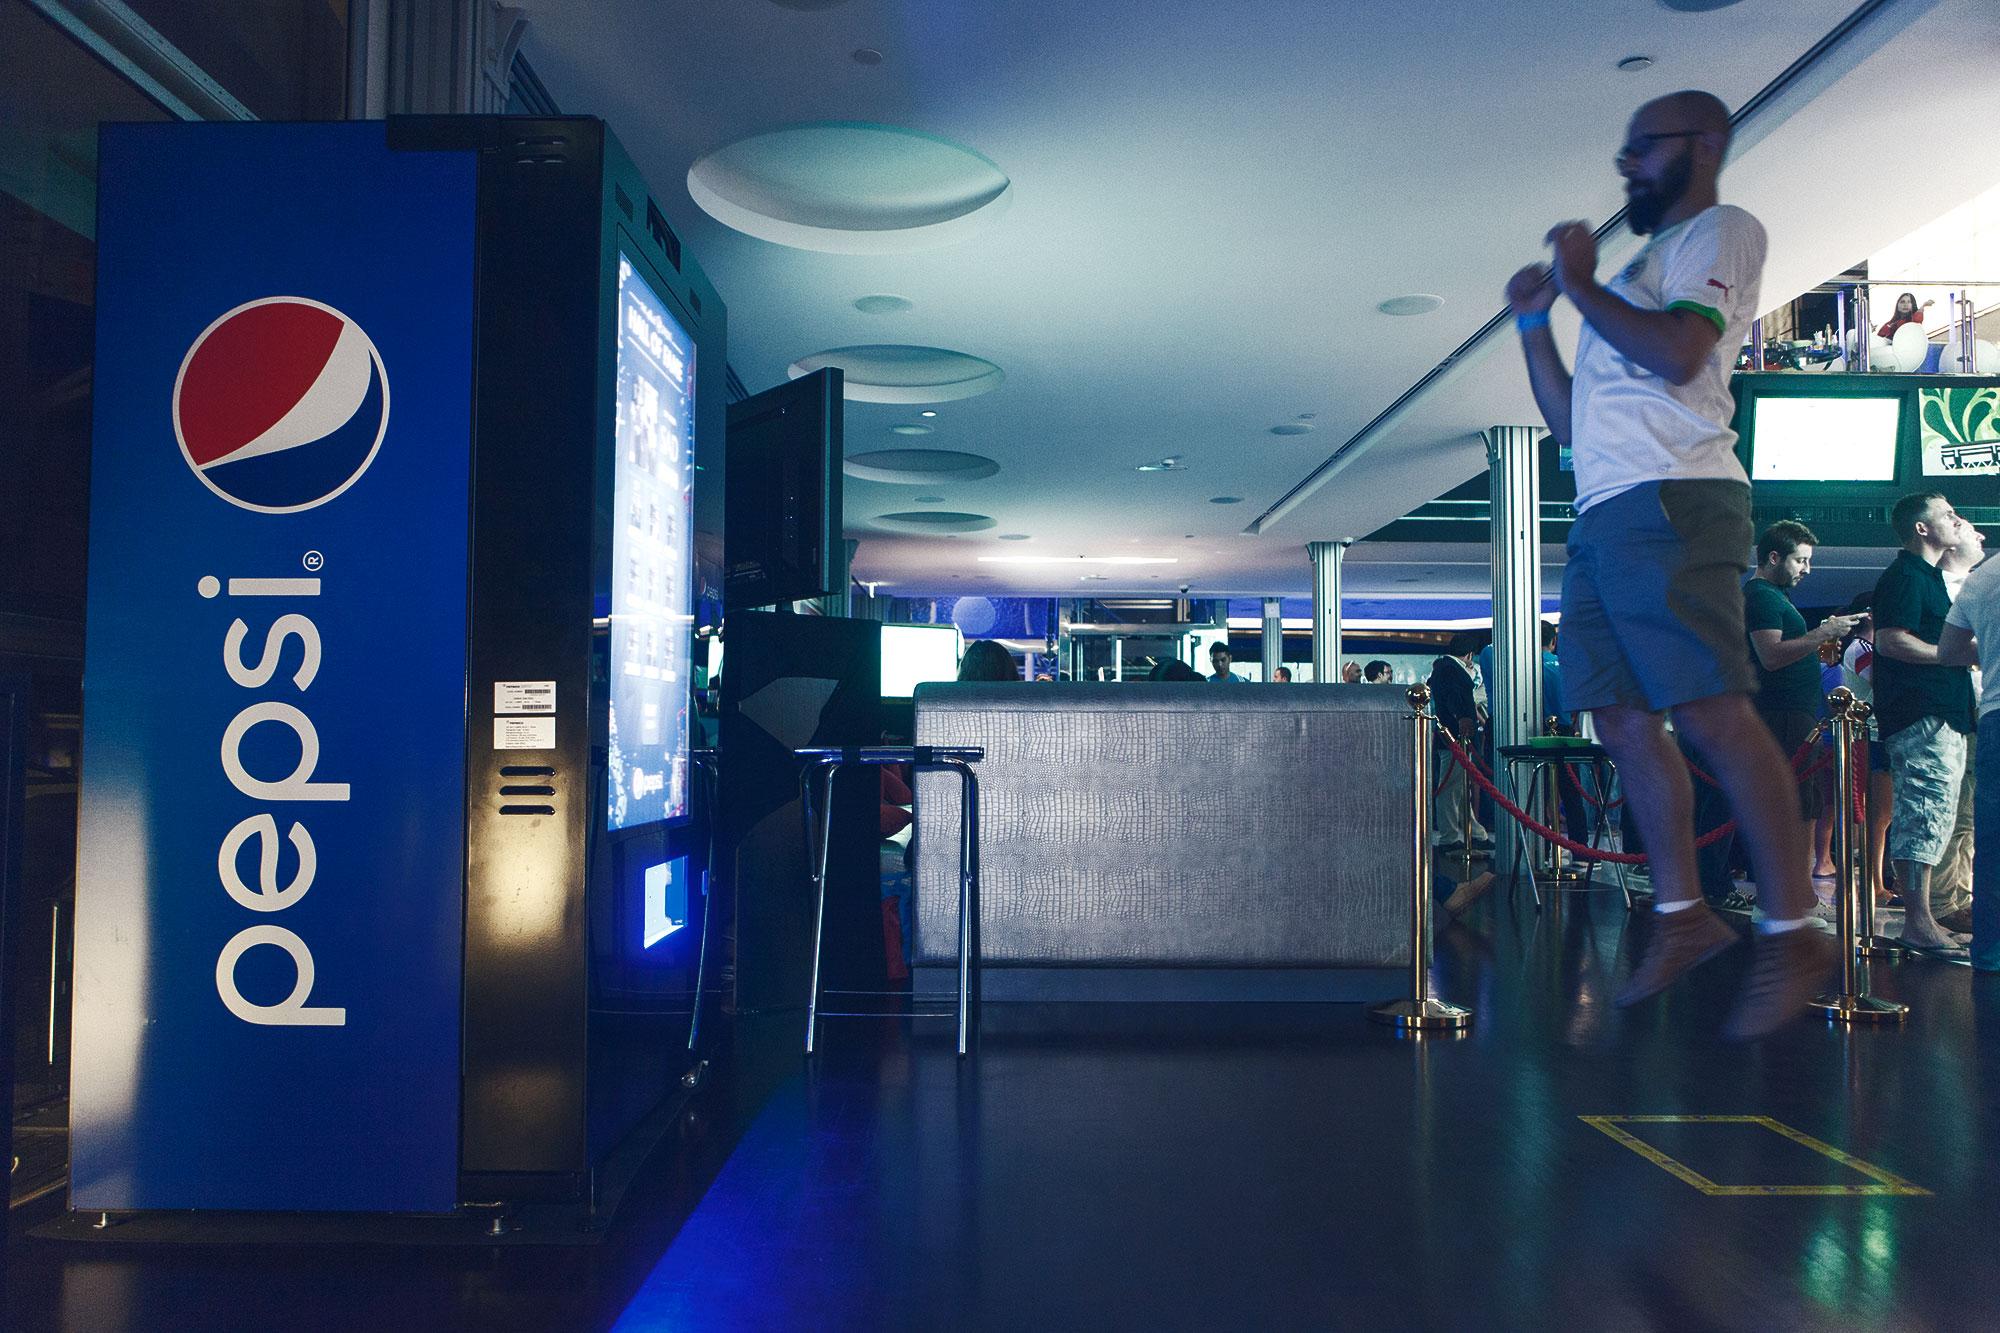 pepsi-launches-interactive-gaming-vending-machine-in-the-uae-kuwait-and-saudi-arabia